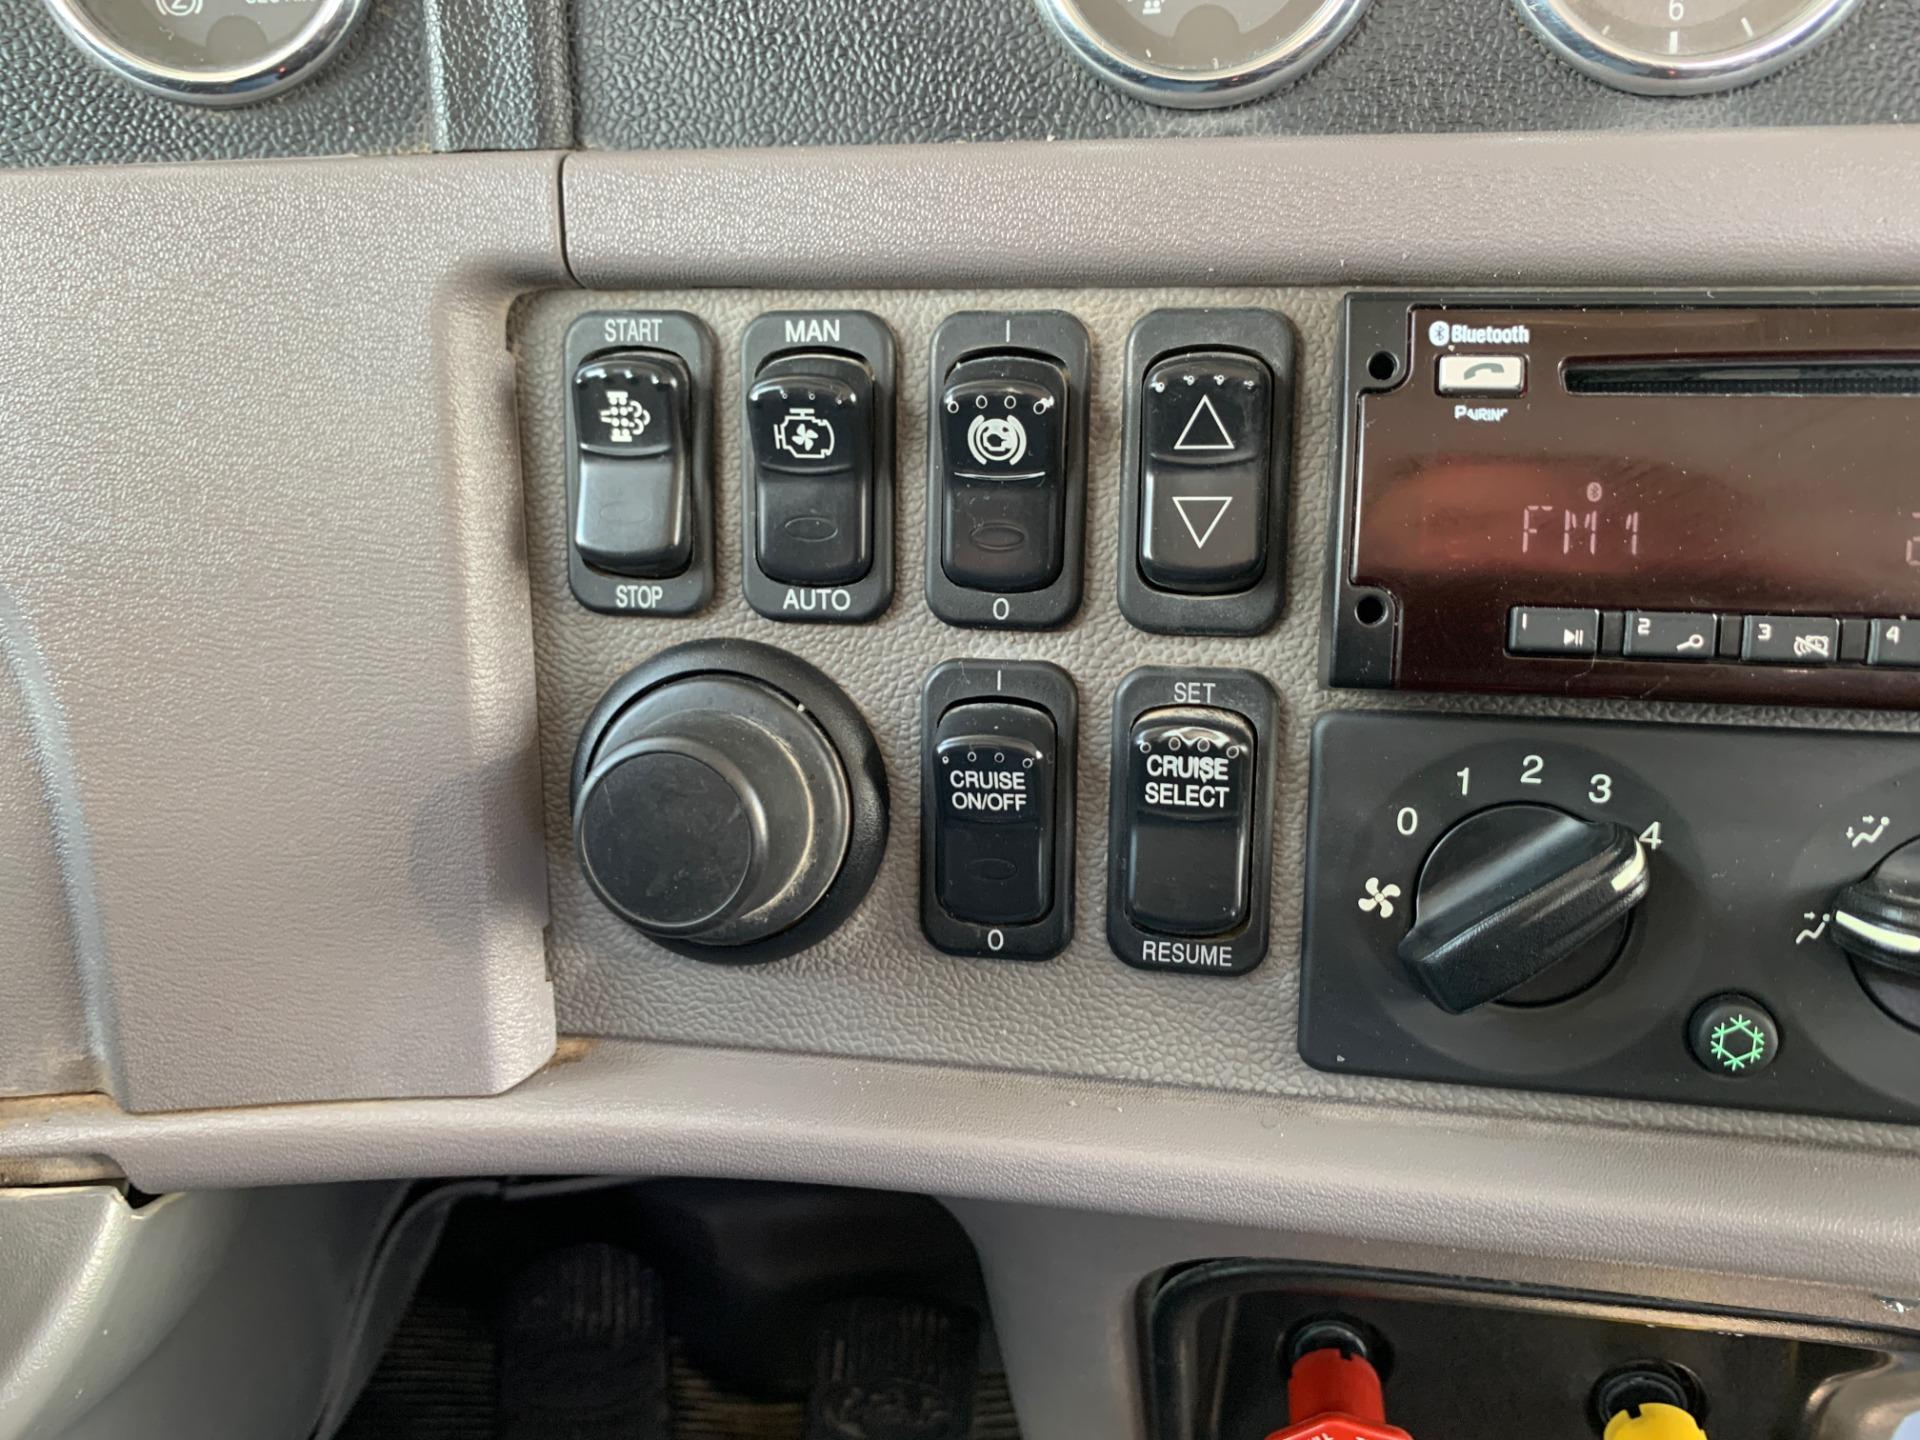 Used-2014-Peterbilt-388-Day-Cab---Cummins-ISX---485-HP---13-Speed